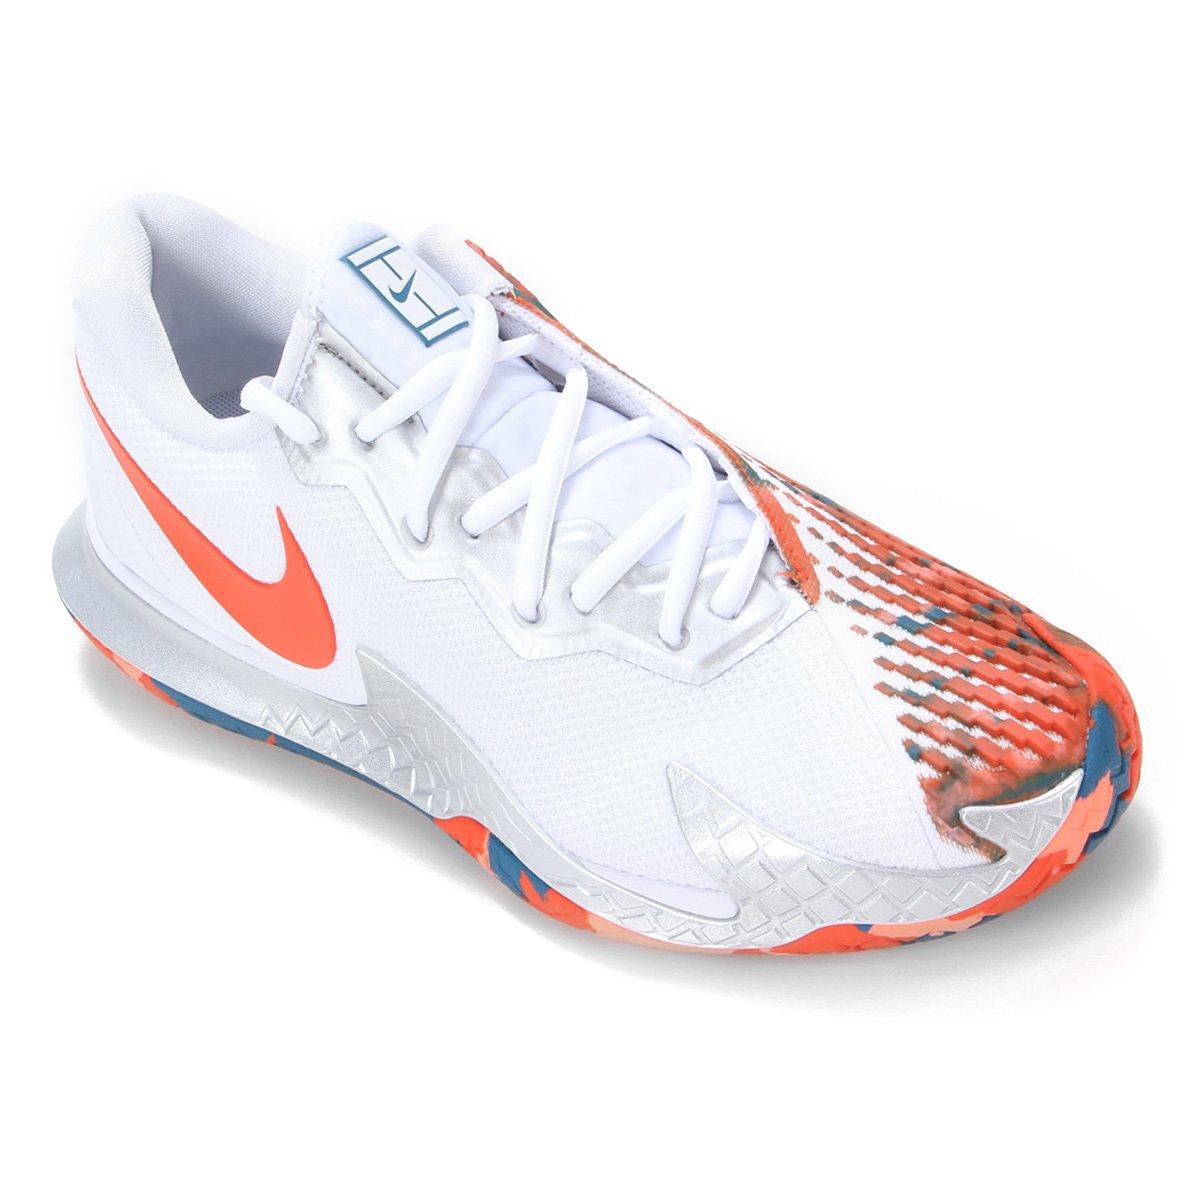 Tênis Nike Air Zoom Vapor Cage 4 HC Branco e Laranja - Masculino